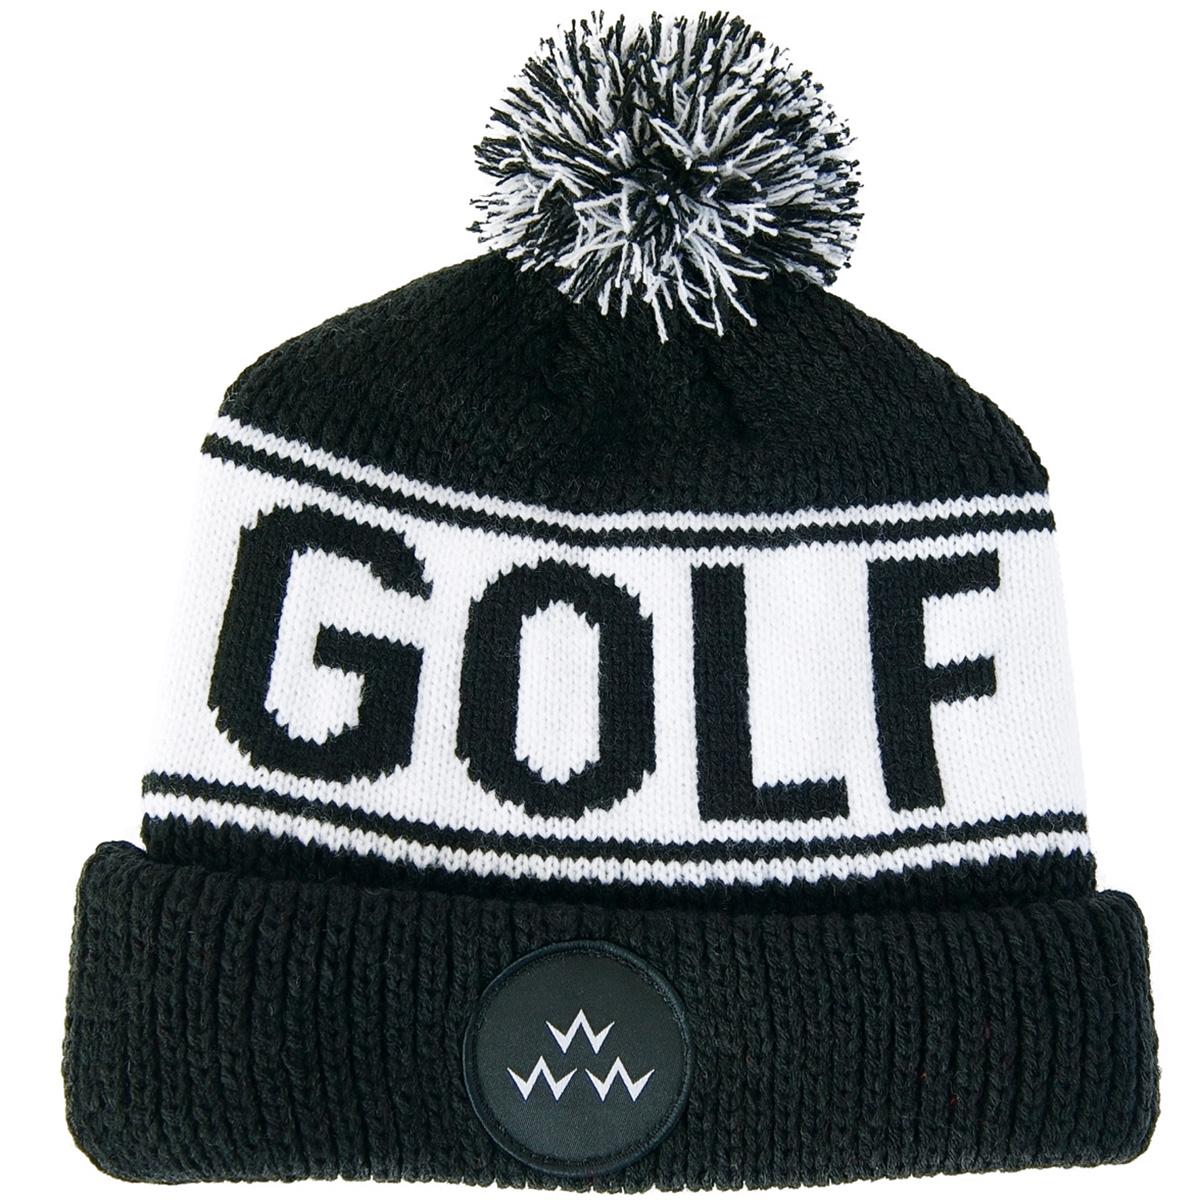 Golf ビーニー